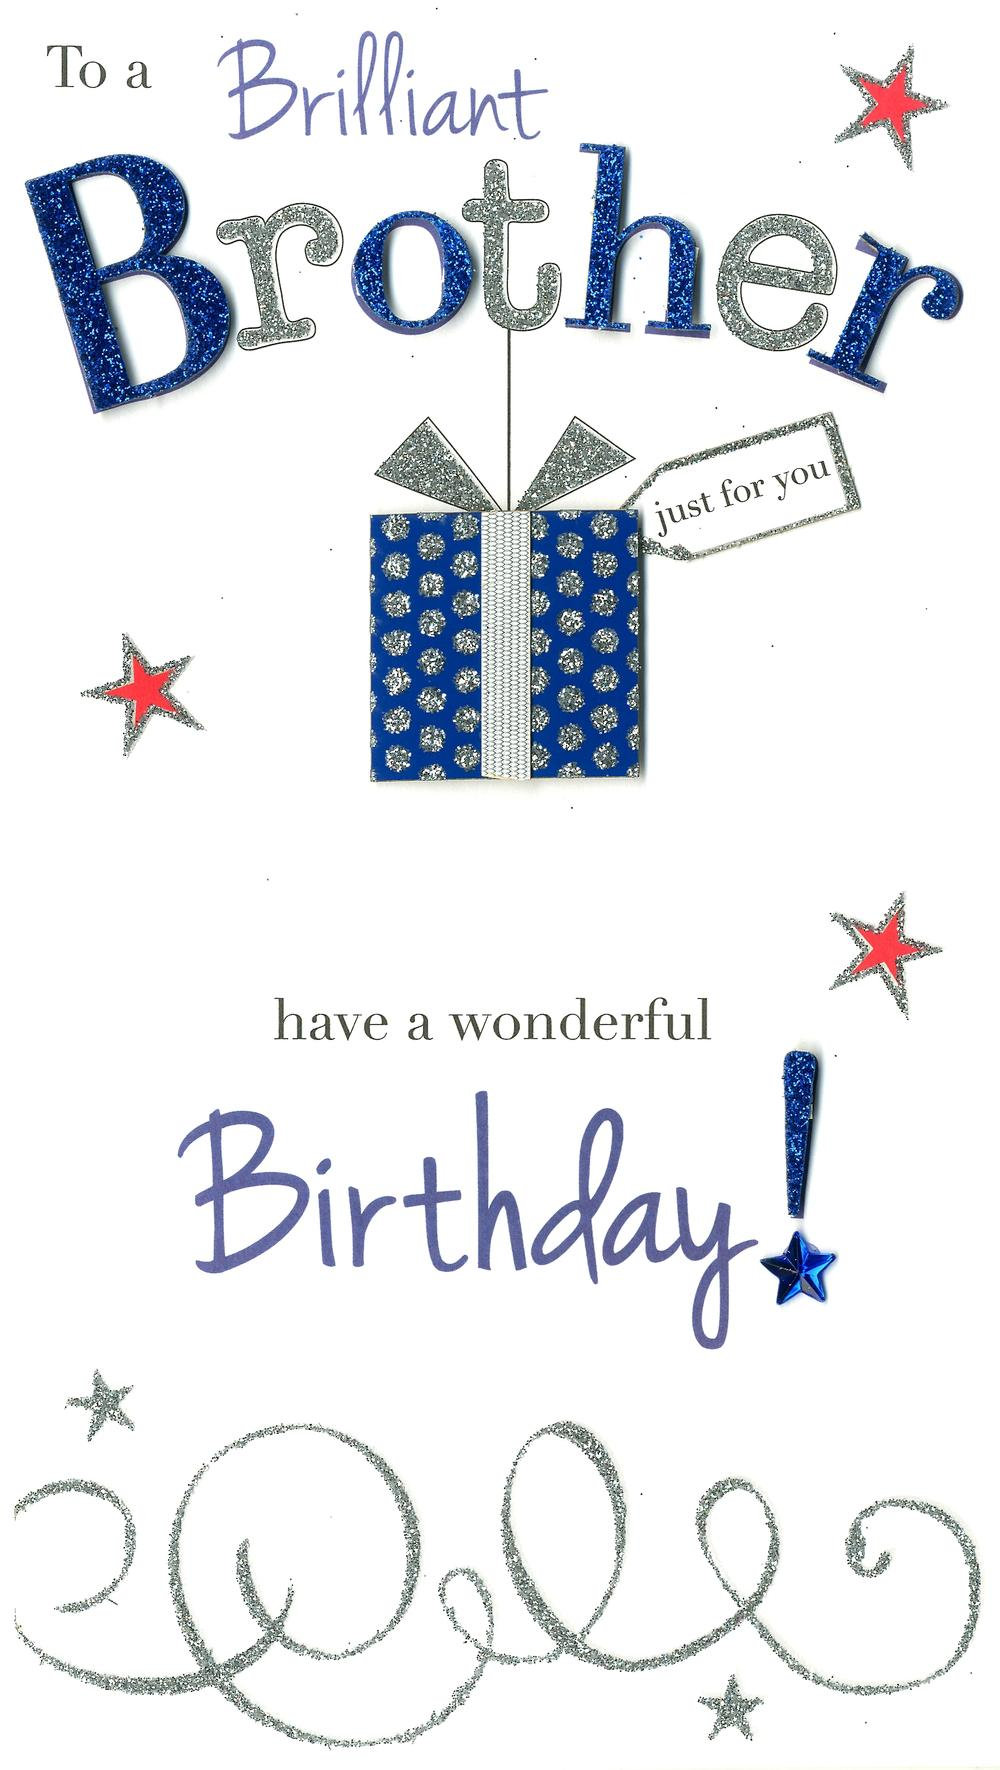 Brilliant Brother Wonderful Birthday Greeting Card